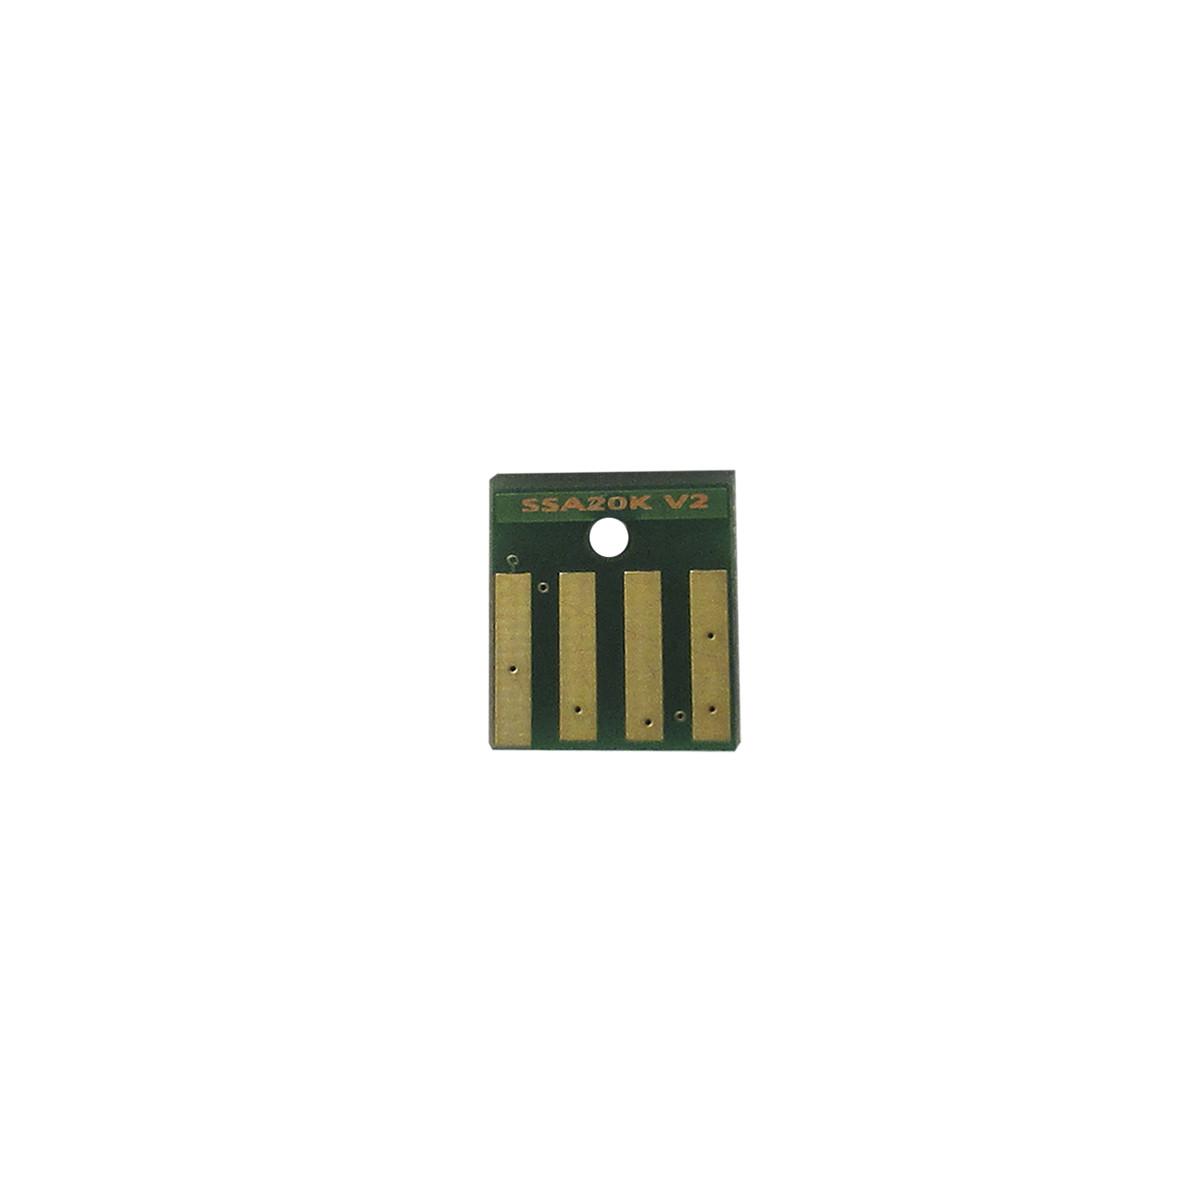 Chip Lexmark 50F4U00 504U | MS610DN MS610DE MS610 MS510DN MX610 MX510 | 20.000 páginas